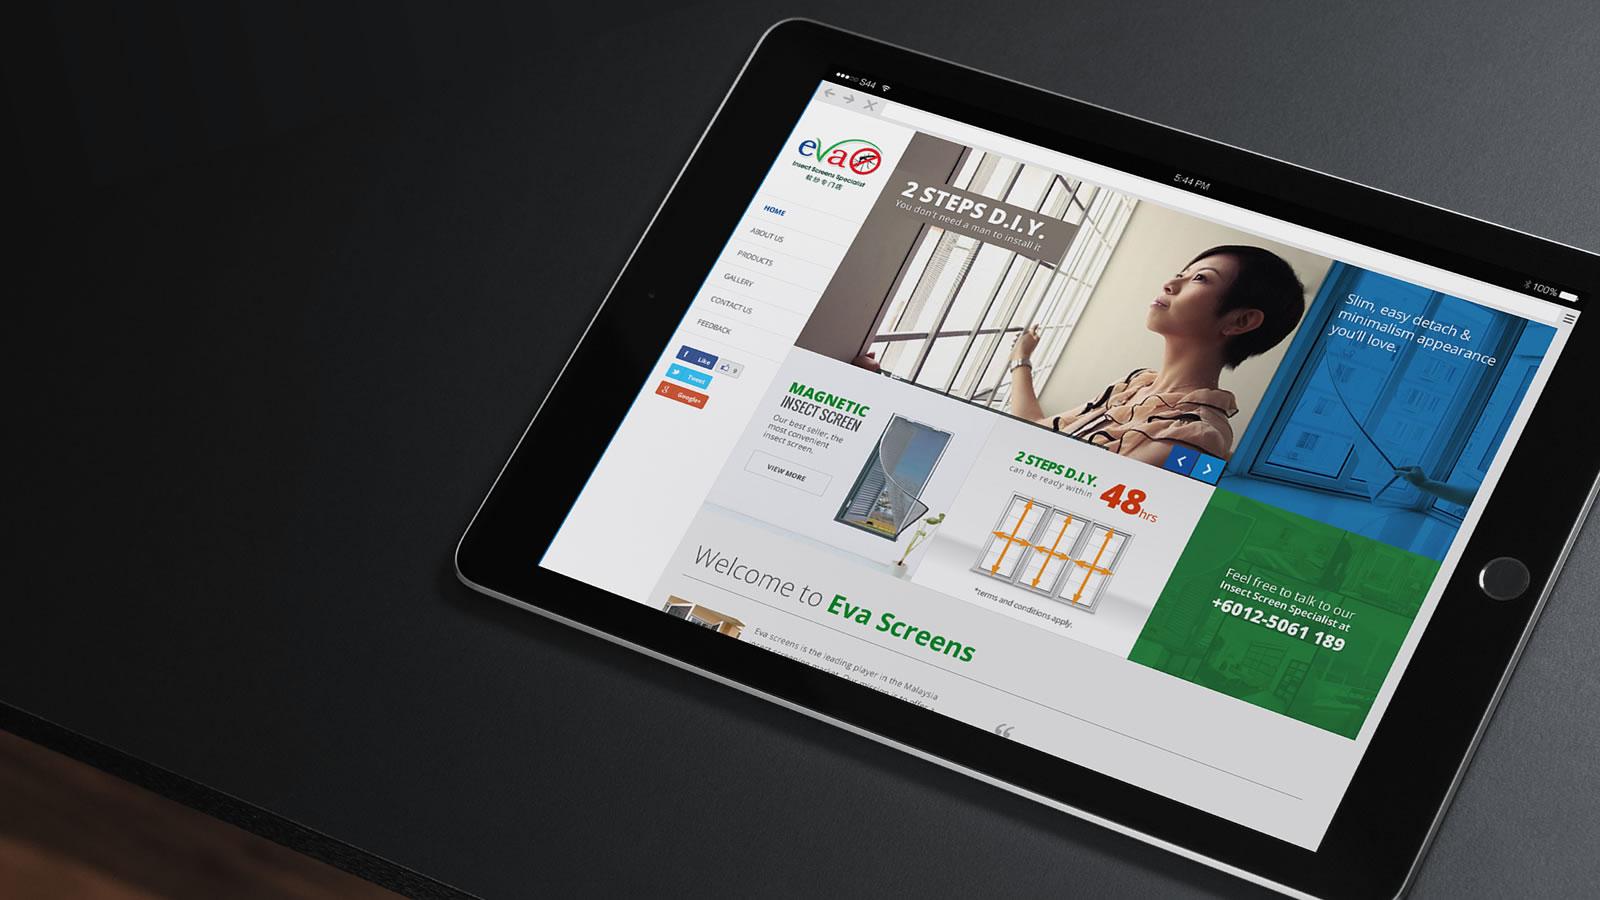 website design jonath lee with iosc